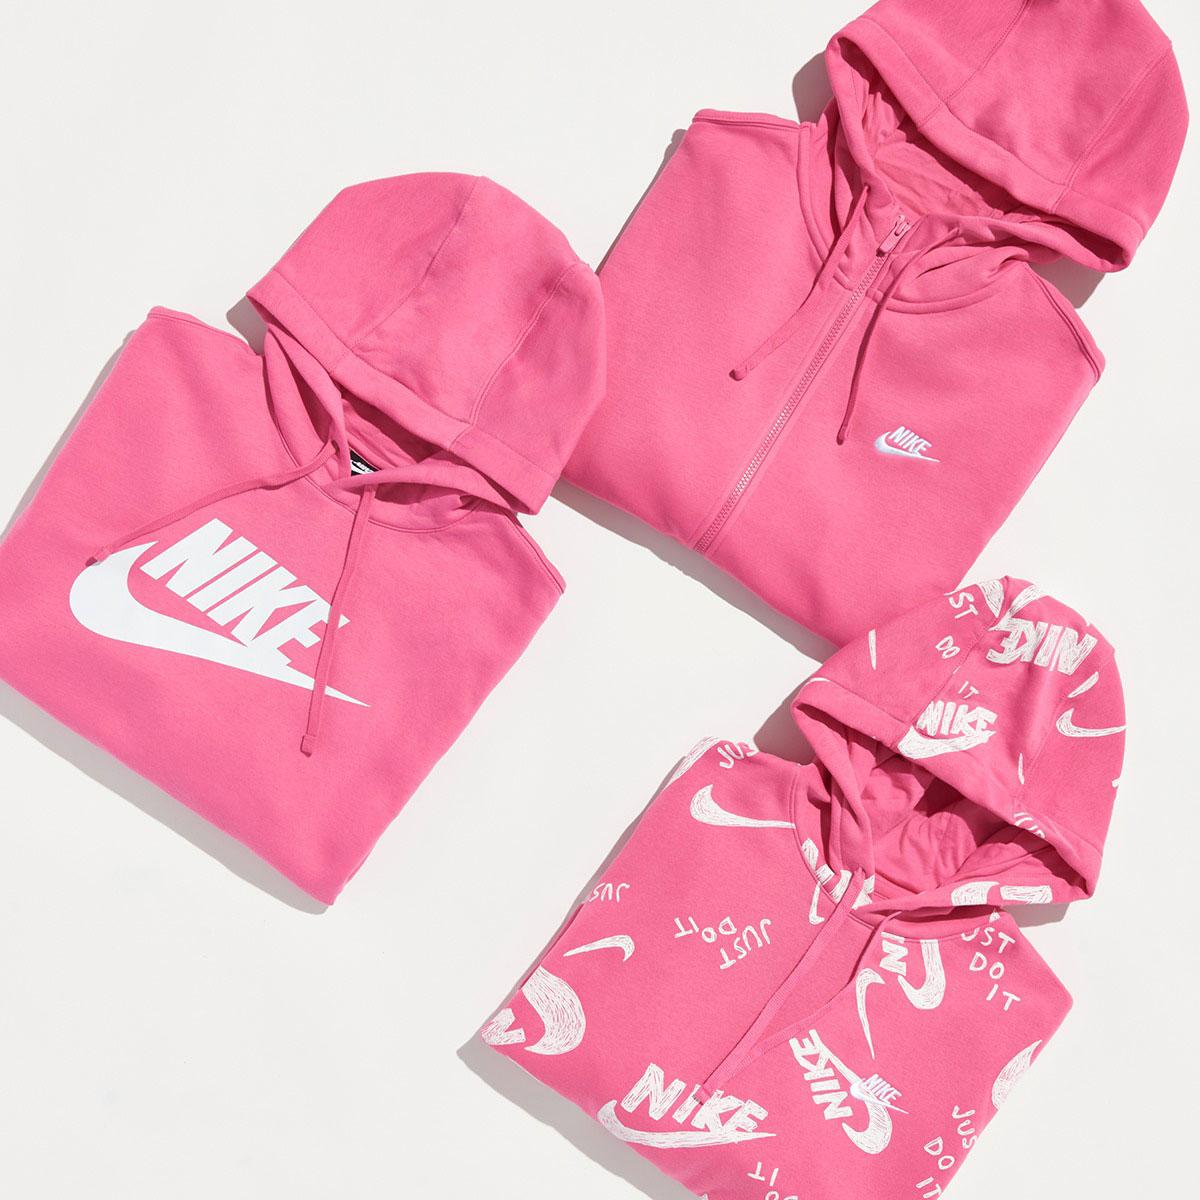 nike-air-max-1-pink-strawberry-lemonade-sneaker-outfit-2